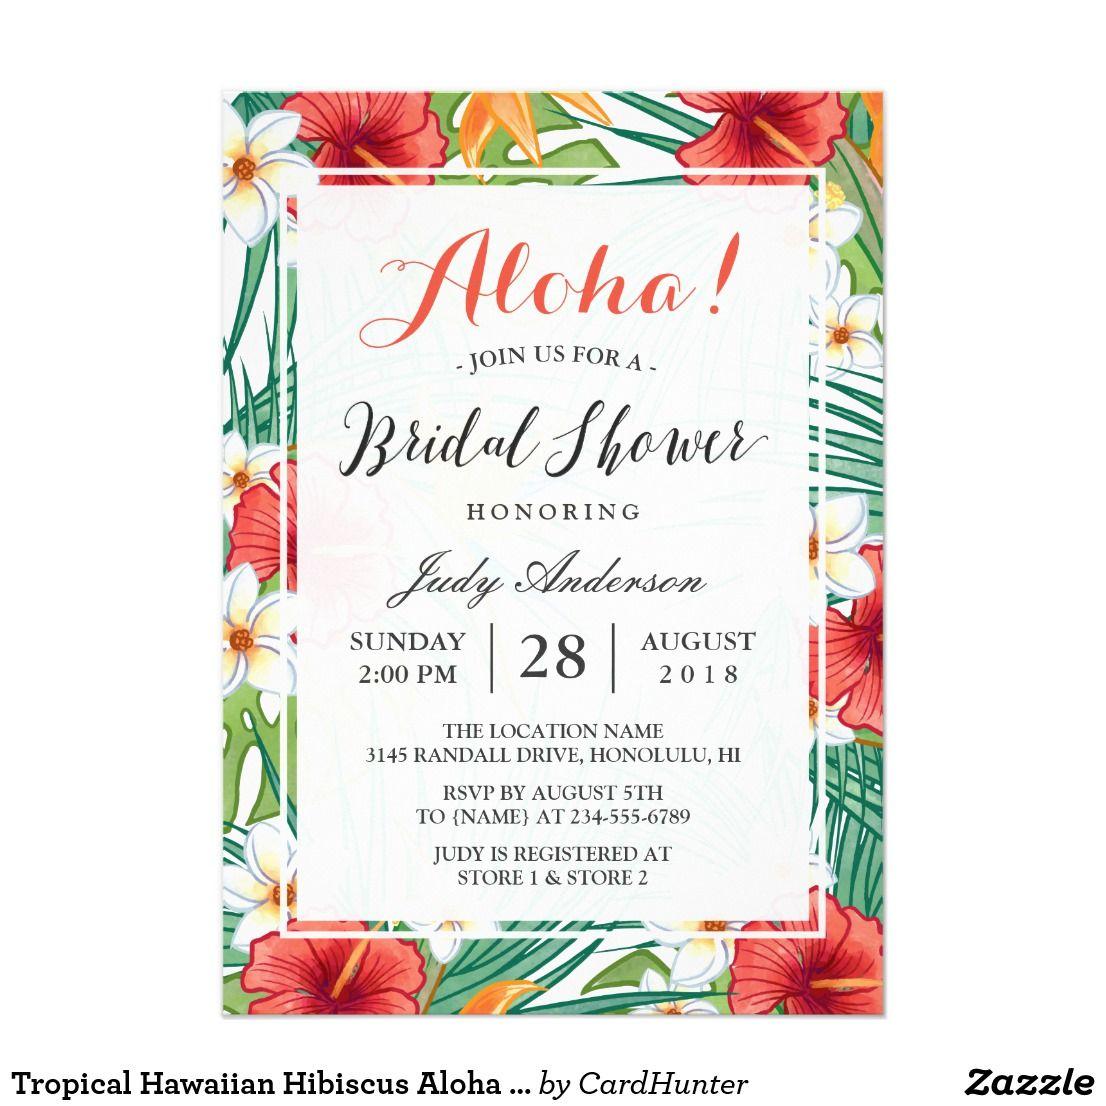 Tropical Hawaiian Hibiscus Aloha Bridal Shower Card ...